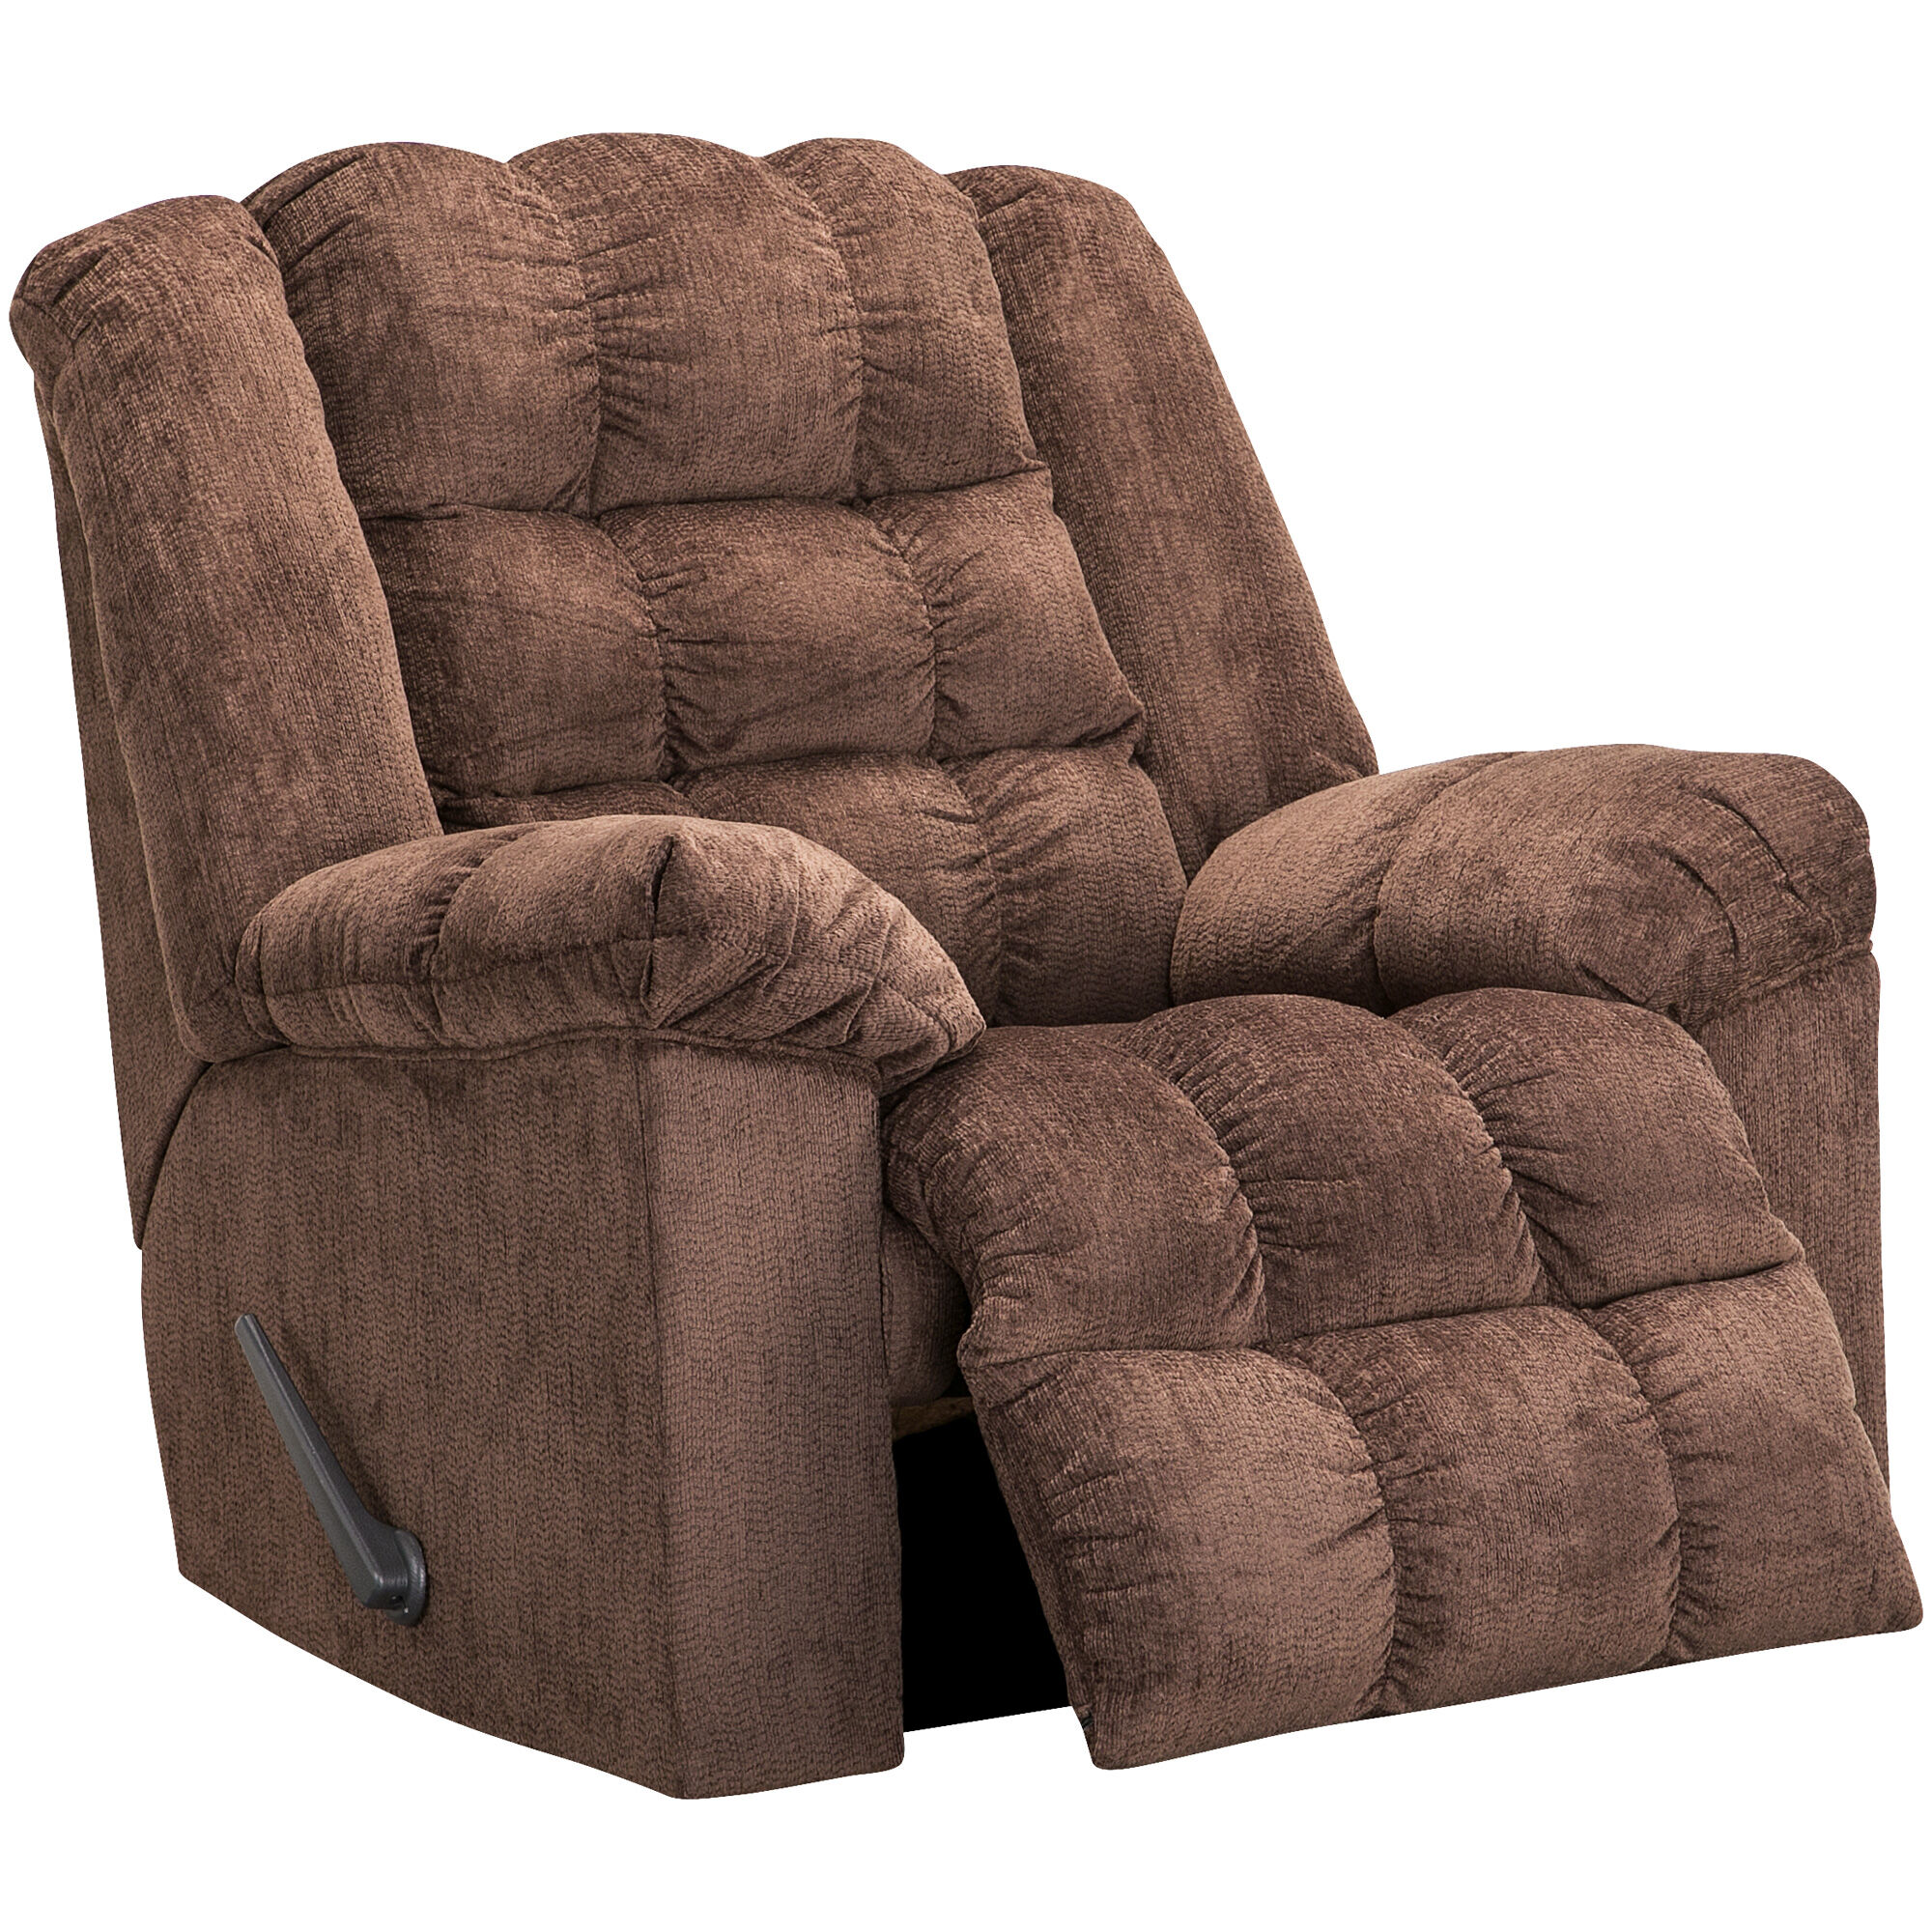 Slumberland Furniture Ludden Cocoa Rocker Recliner